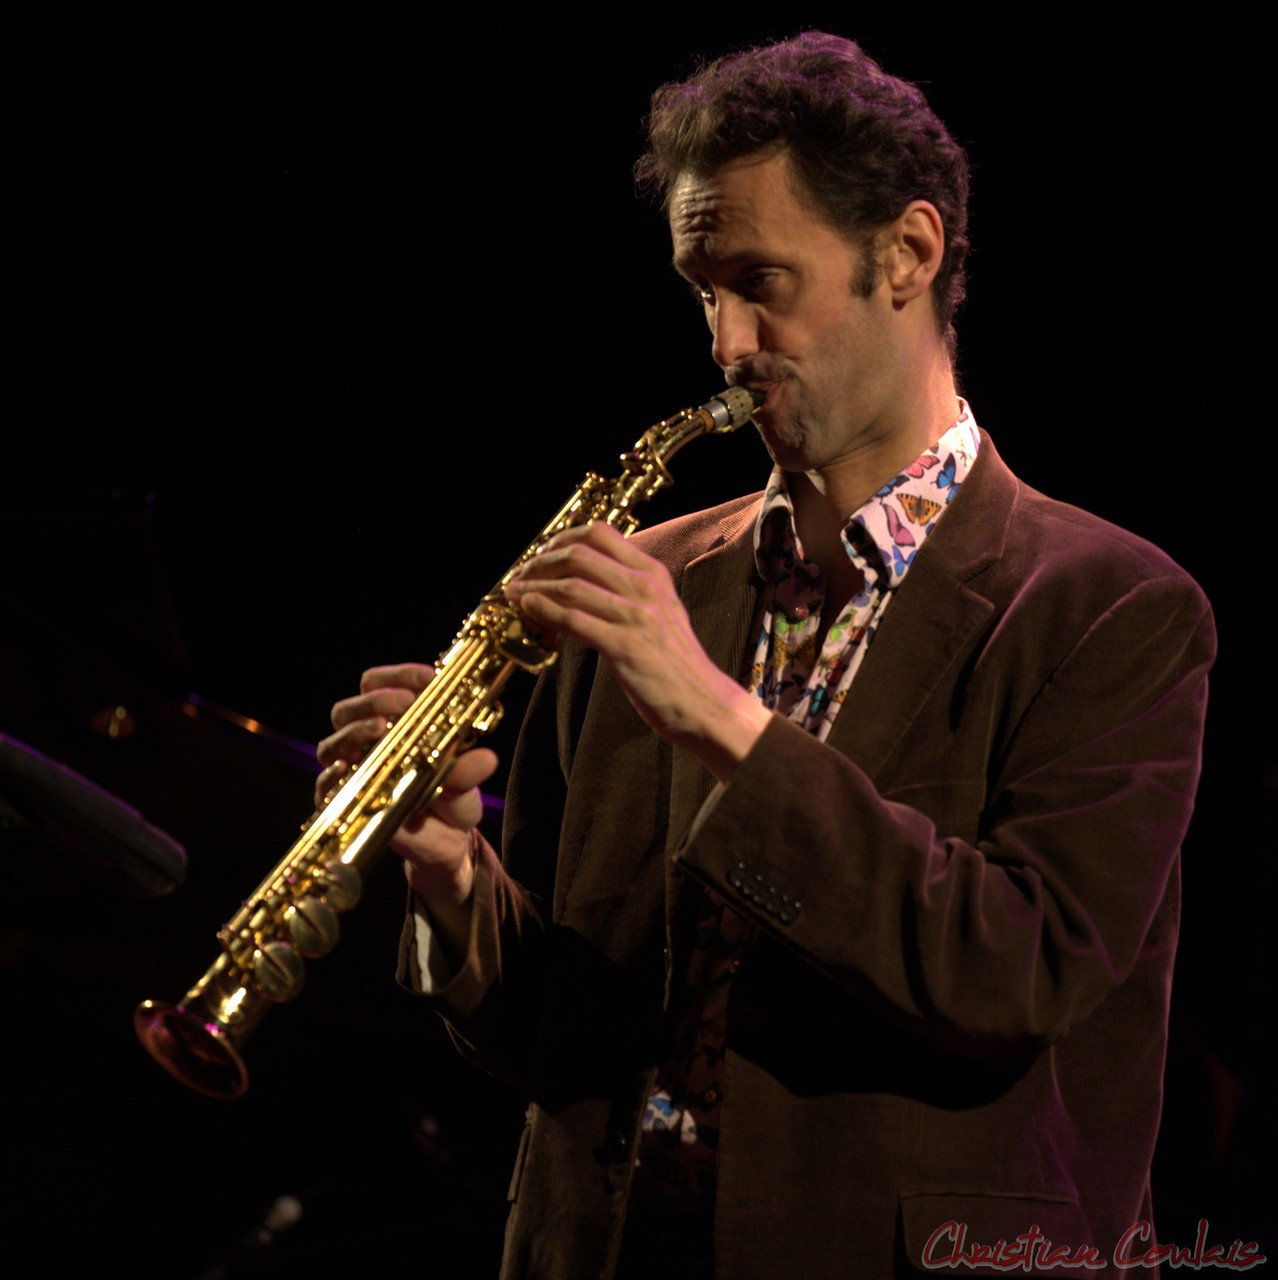 Festival JAZZ360 2014, Christophe Laborde, Christophe Laborde Quartet feat Giovanni Mirabassi, Cénac